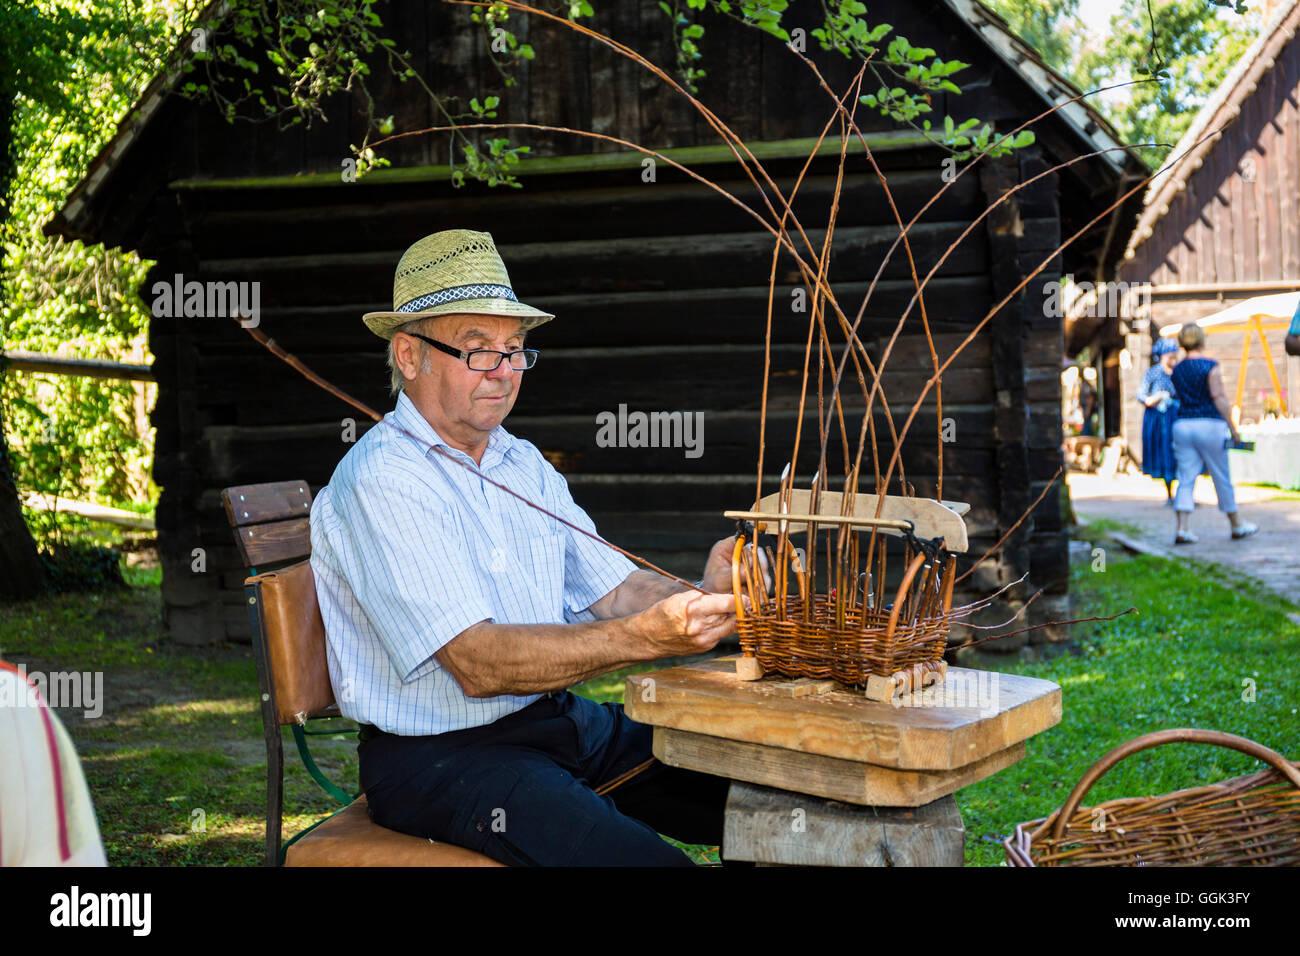 Basket maker in the Open Air Museum Lehde, Spreewald, UNESCO biosphere reserve, Lübbenau, Brandenburg, Germany, - Stock Image